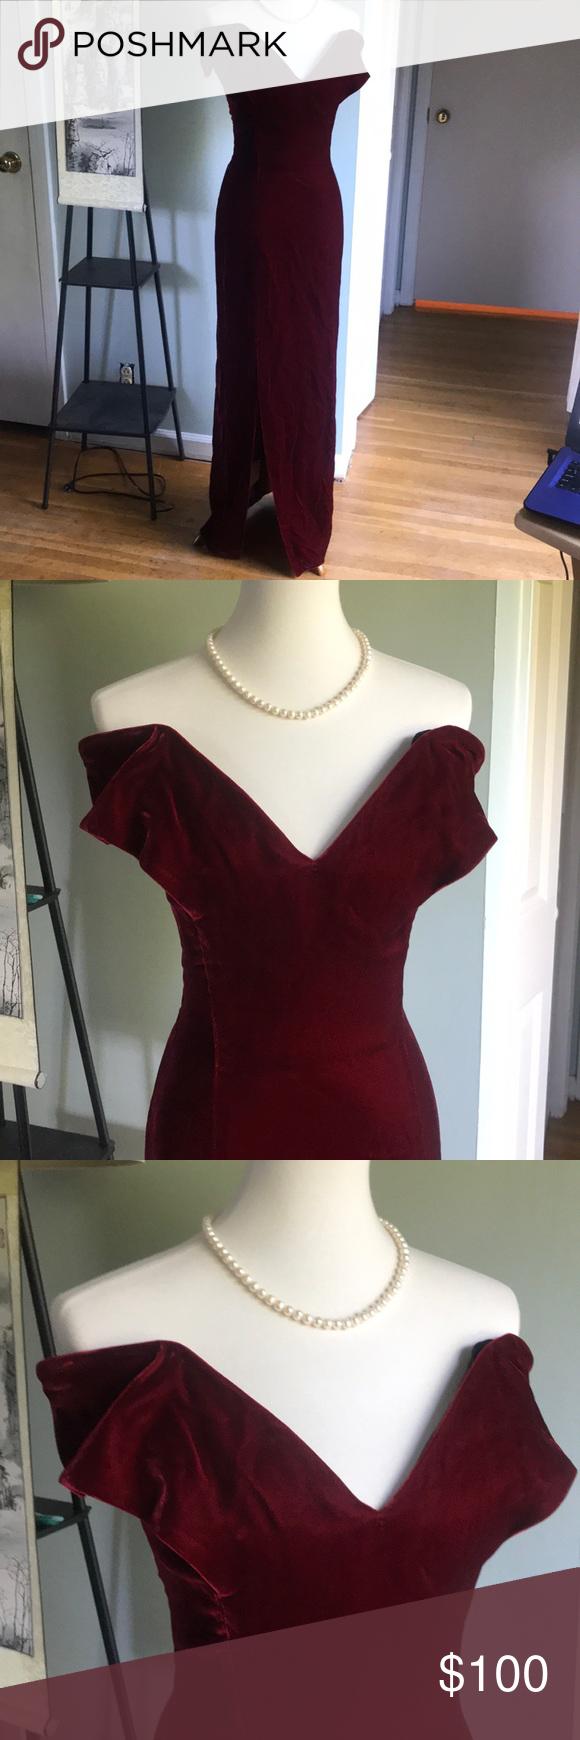 True Vintage Host Pick 6 24 Red Velvet Gown Velvet Gown Clothes Design Vintage Dresses [ 1740 x 580 Pixel ]